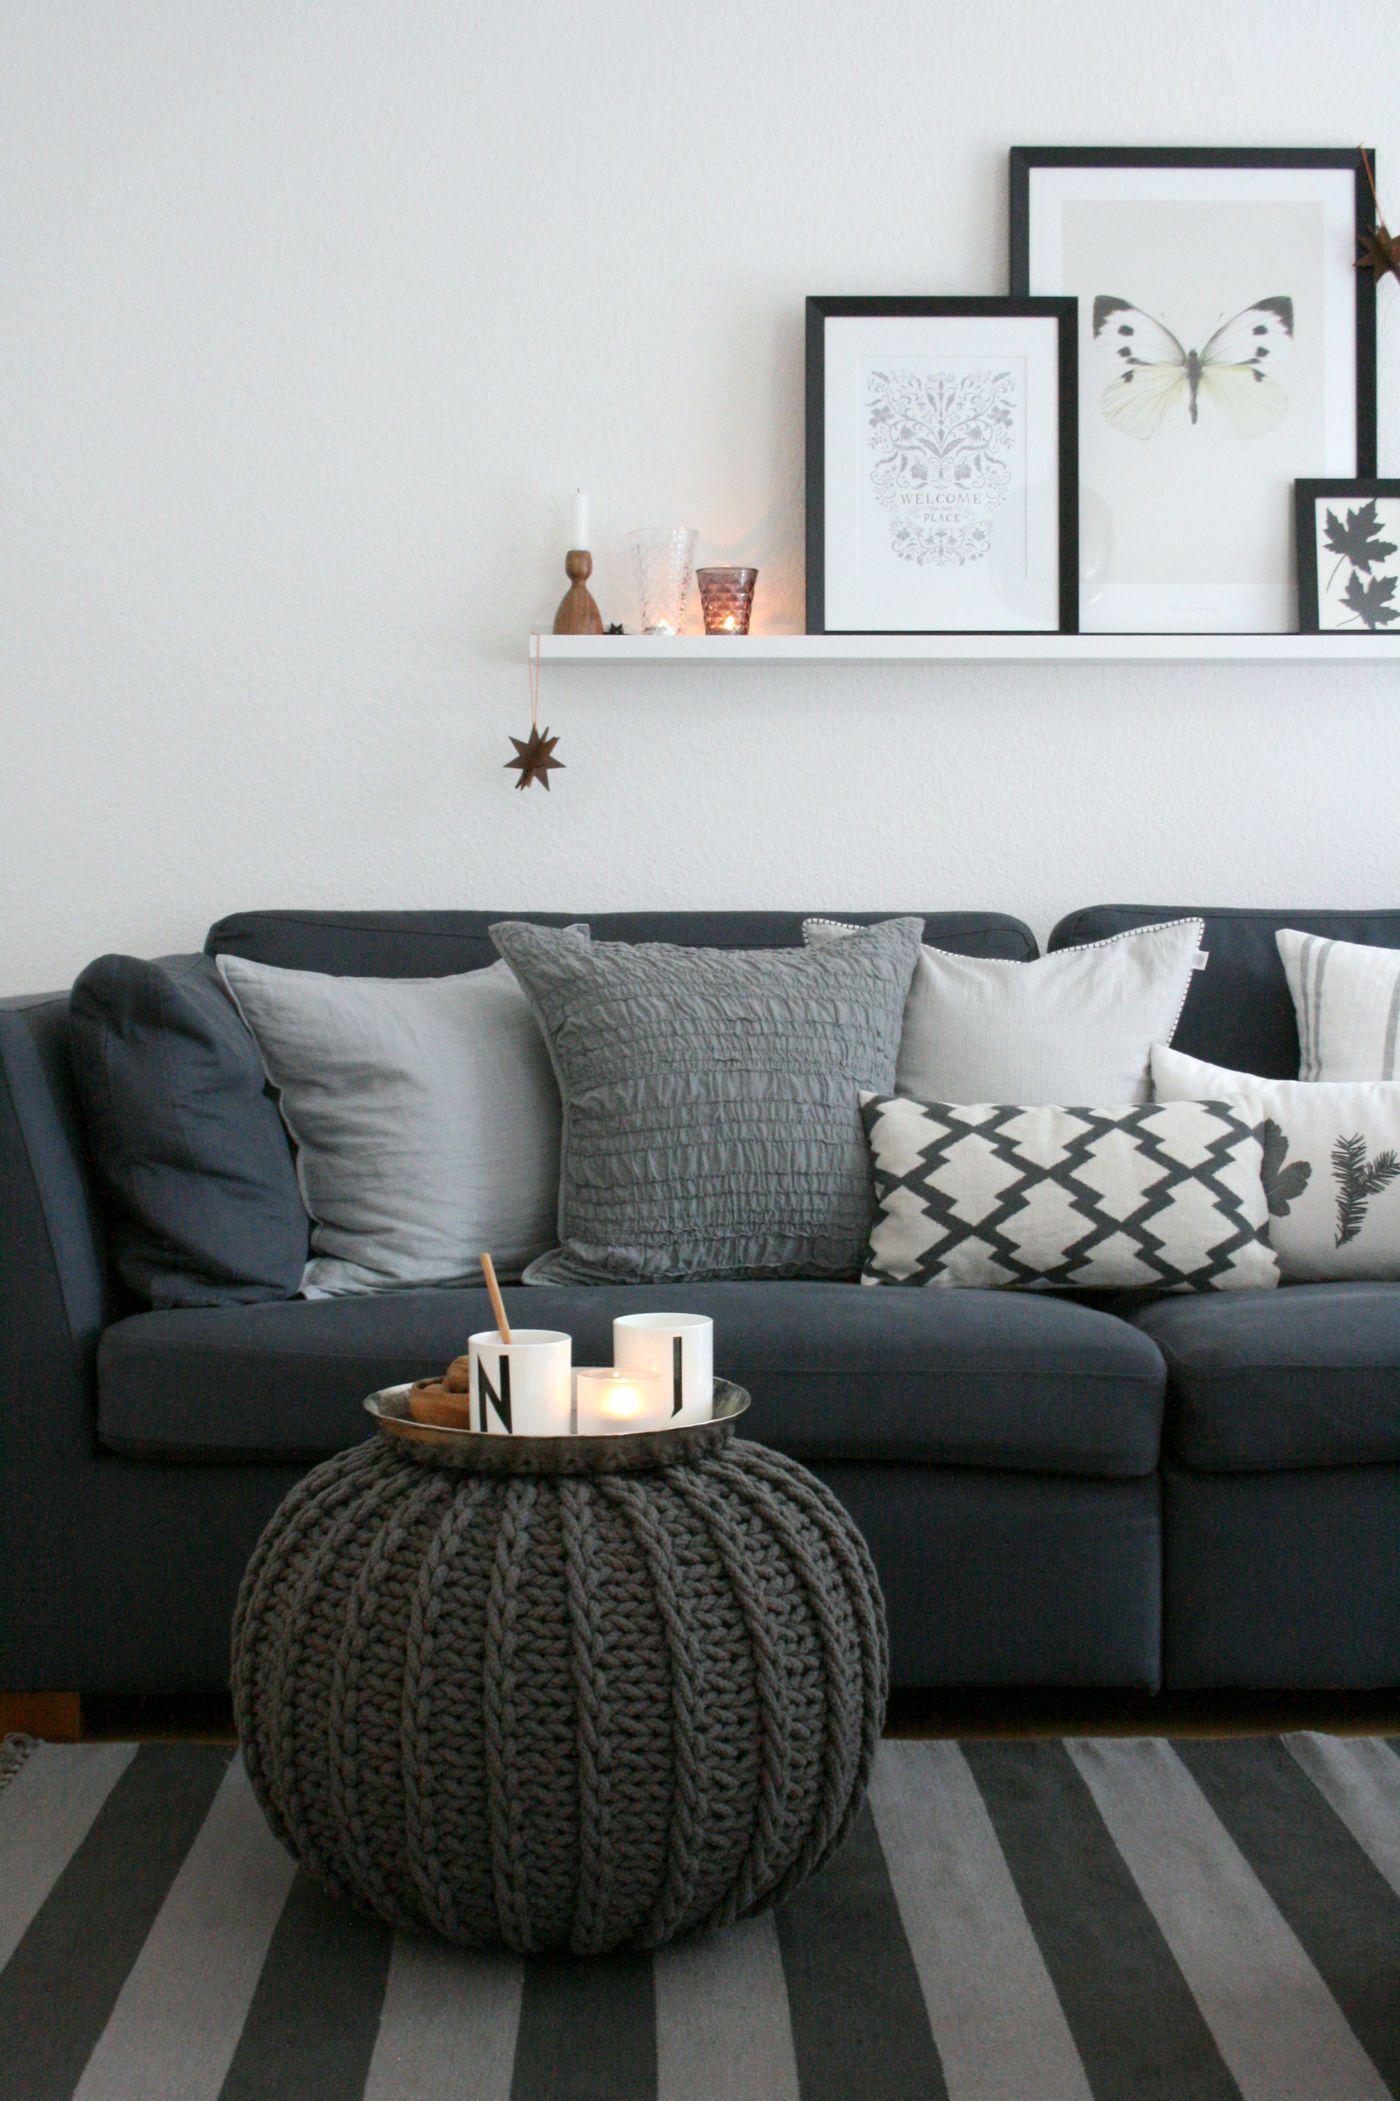 Wandgestaltung Wohnzimmer. Grau In Grau